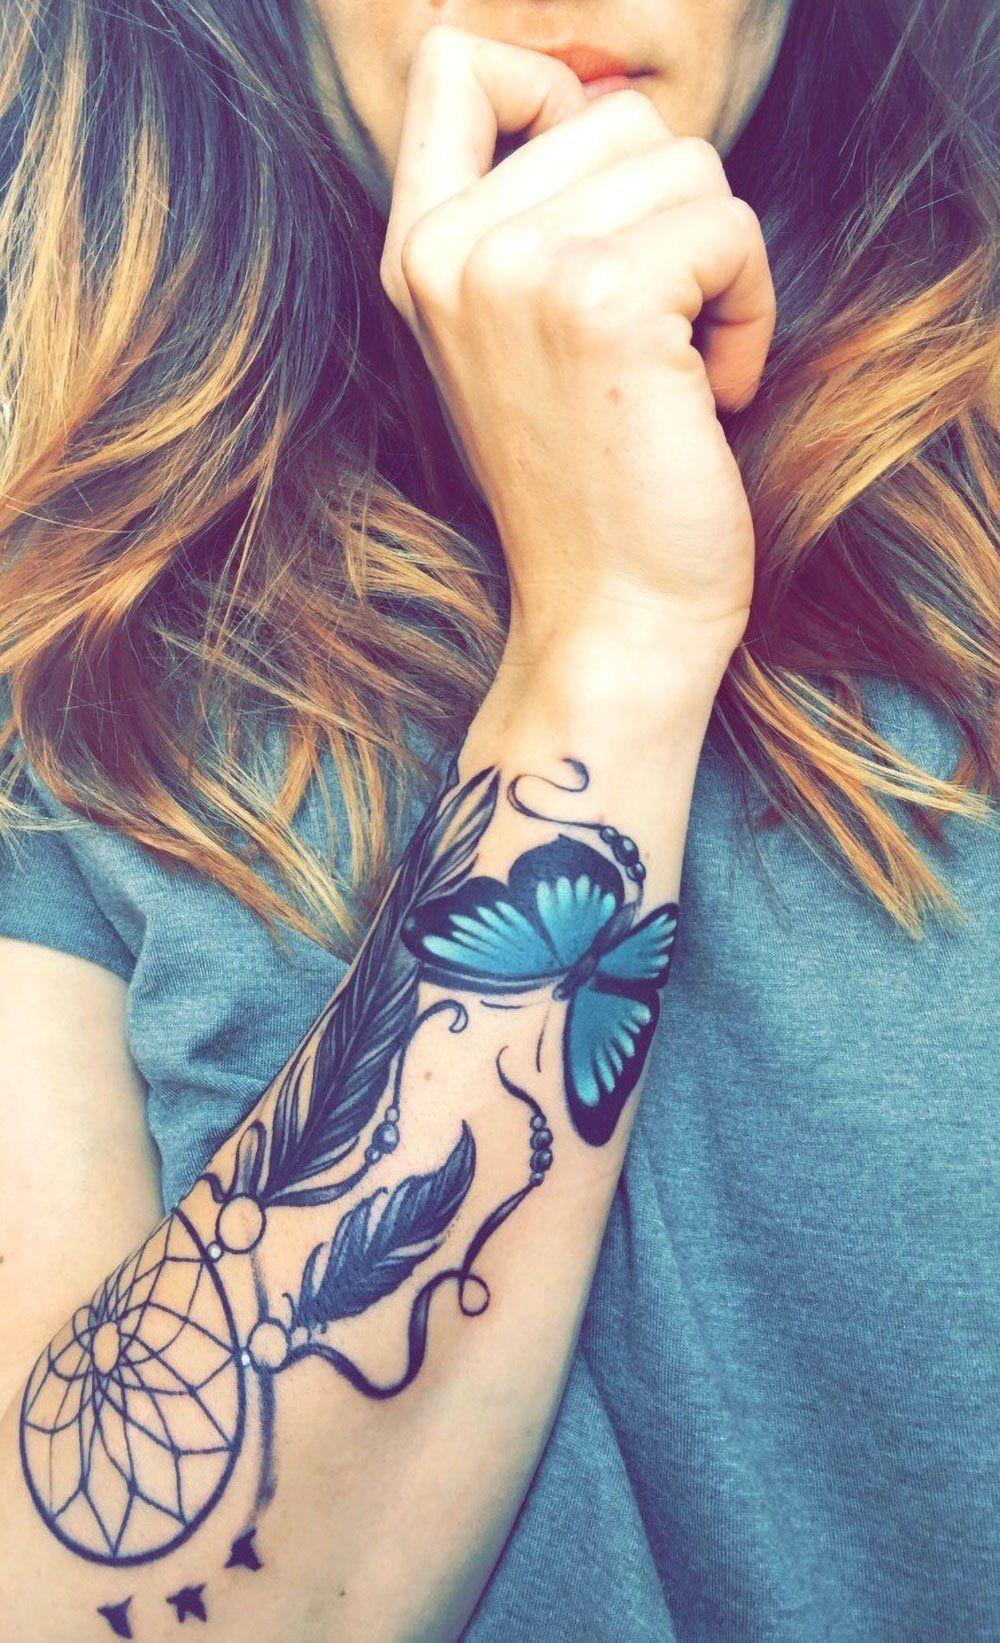 Free Online Resize Image Web Base Tool Online Photo Editor Forearm Tattoo Women Wrist Tattoo Cover Up Body Tattoo Design